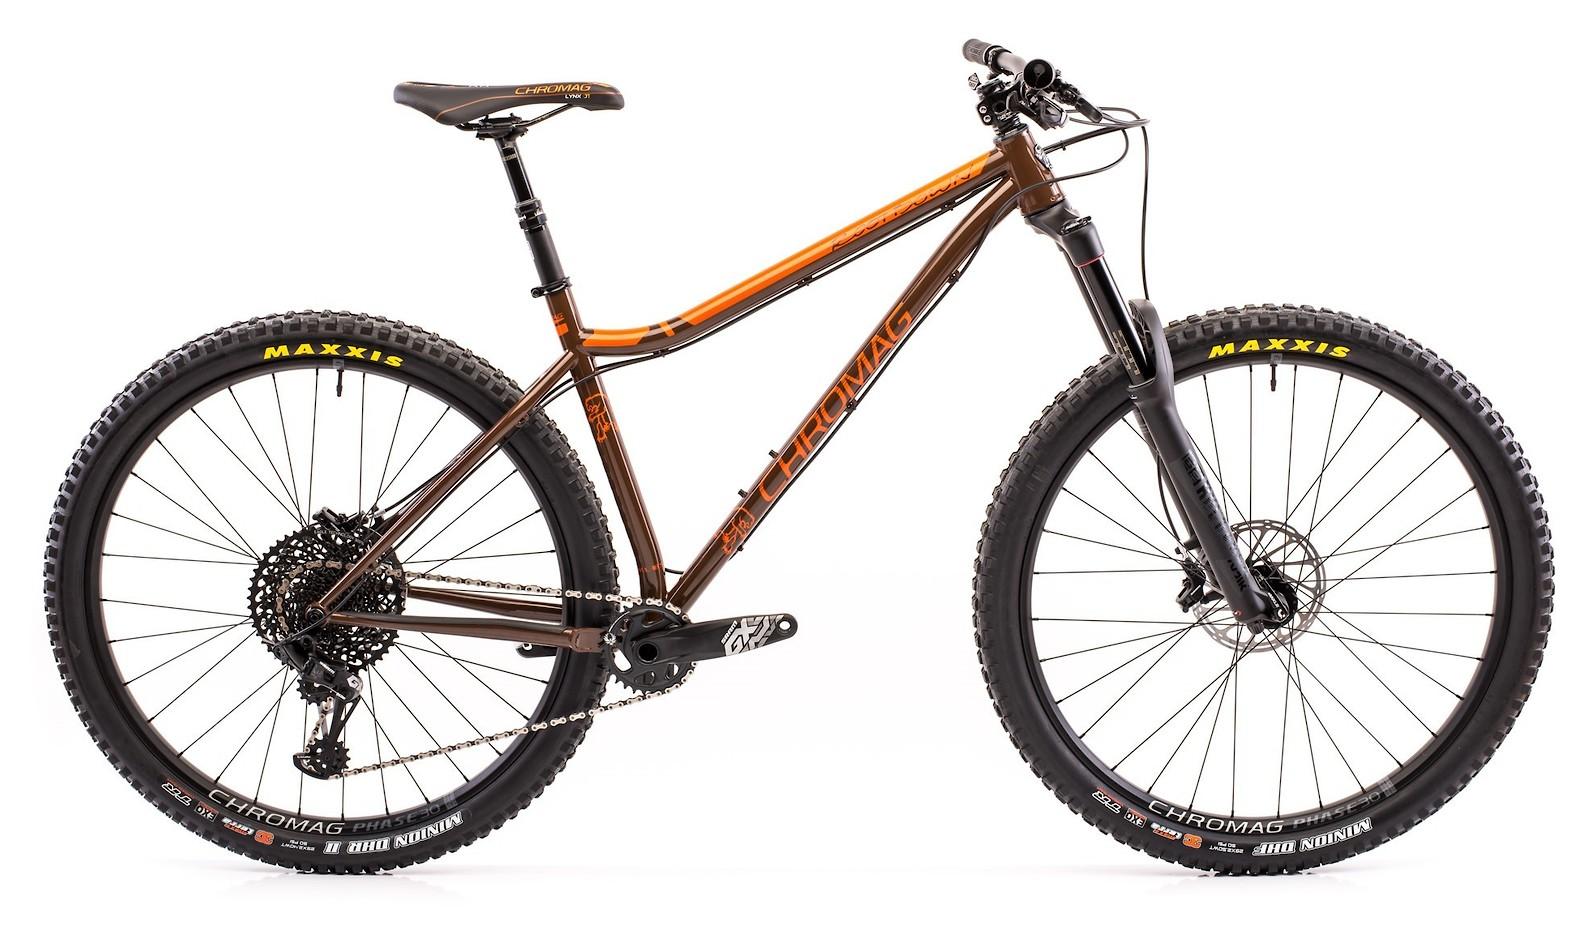 Chromag-Rootdown-Complete-brown